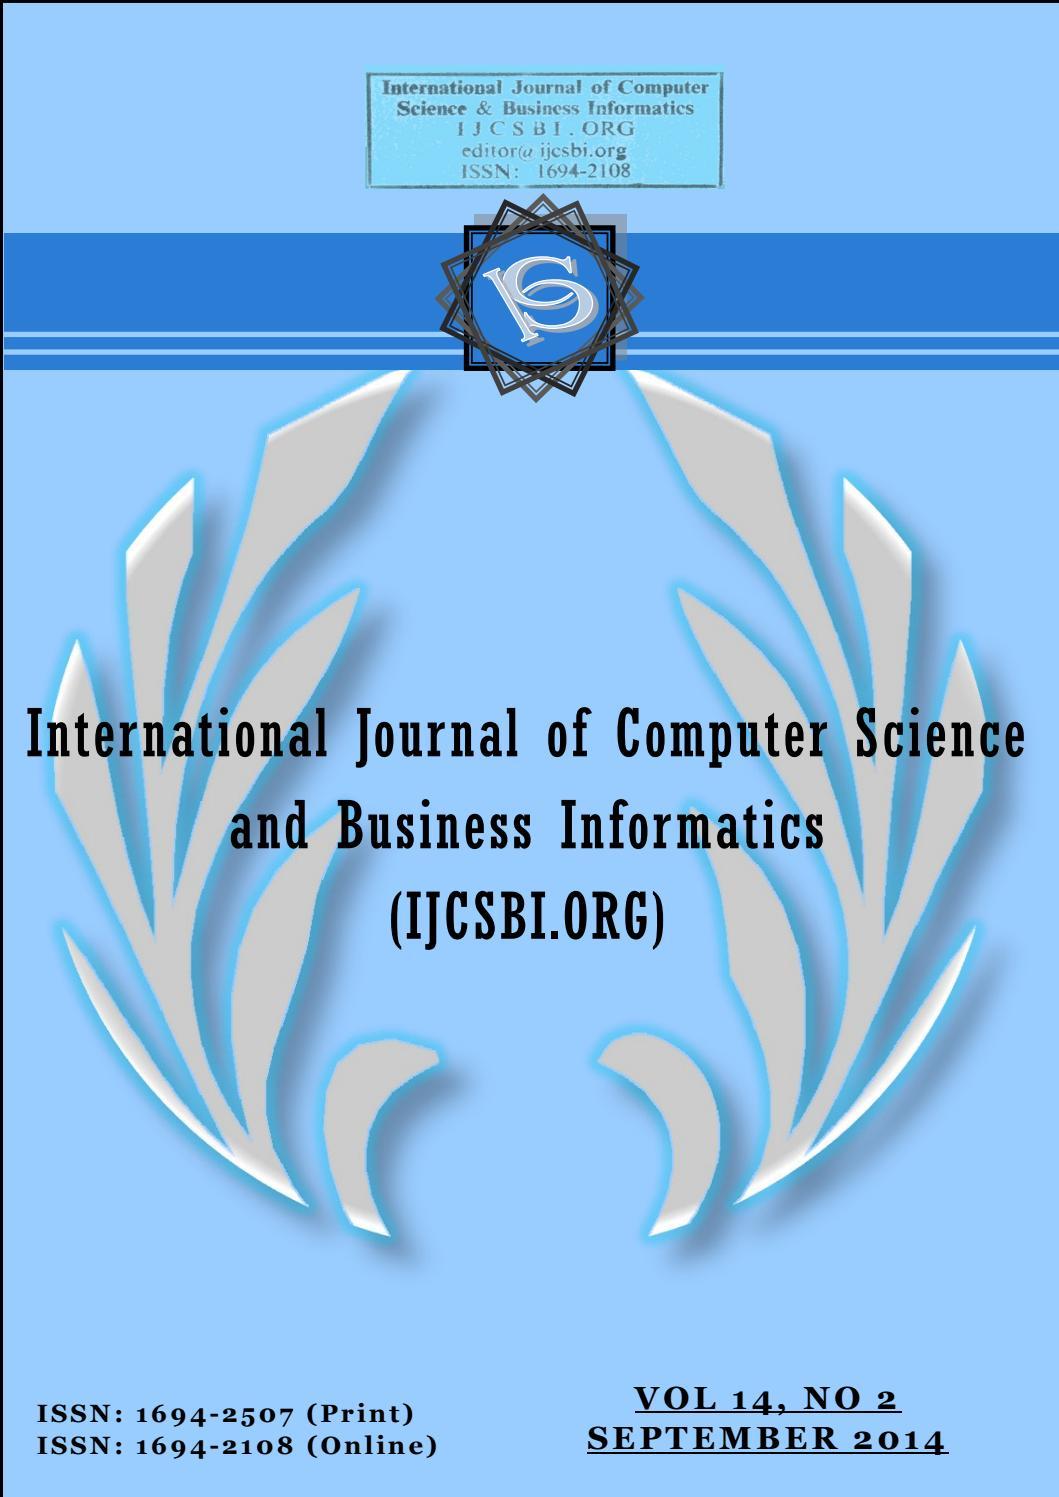 Vol 14 no 2 september 2014 by IJCSBI ORG - issuu